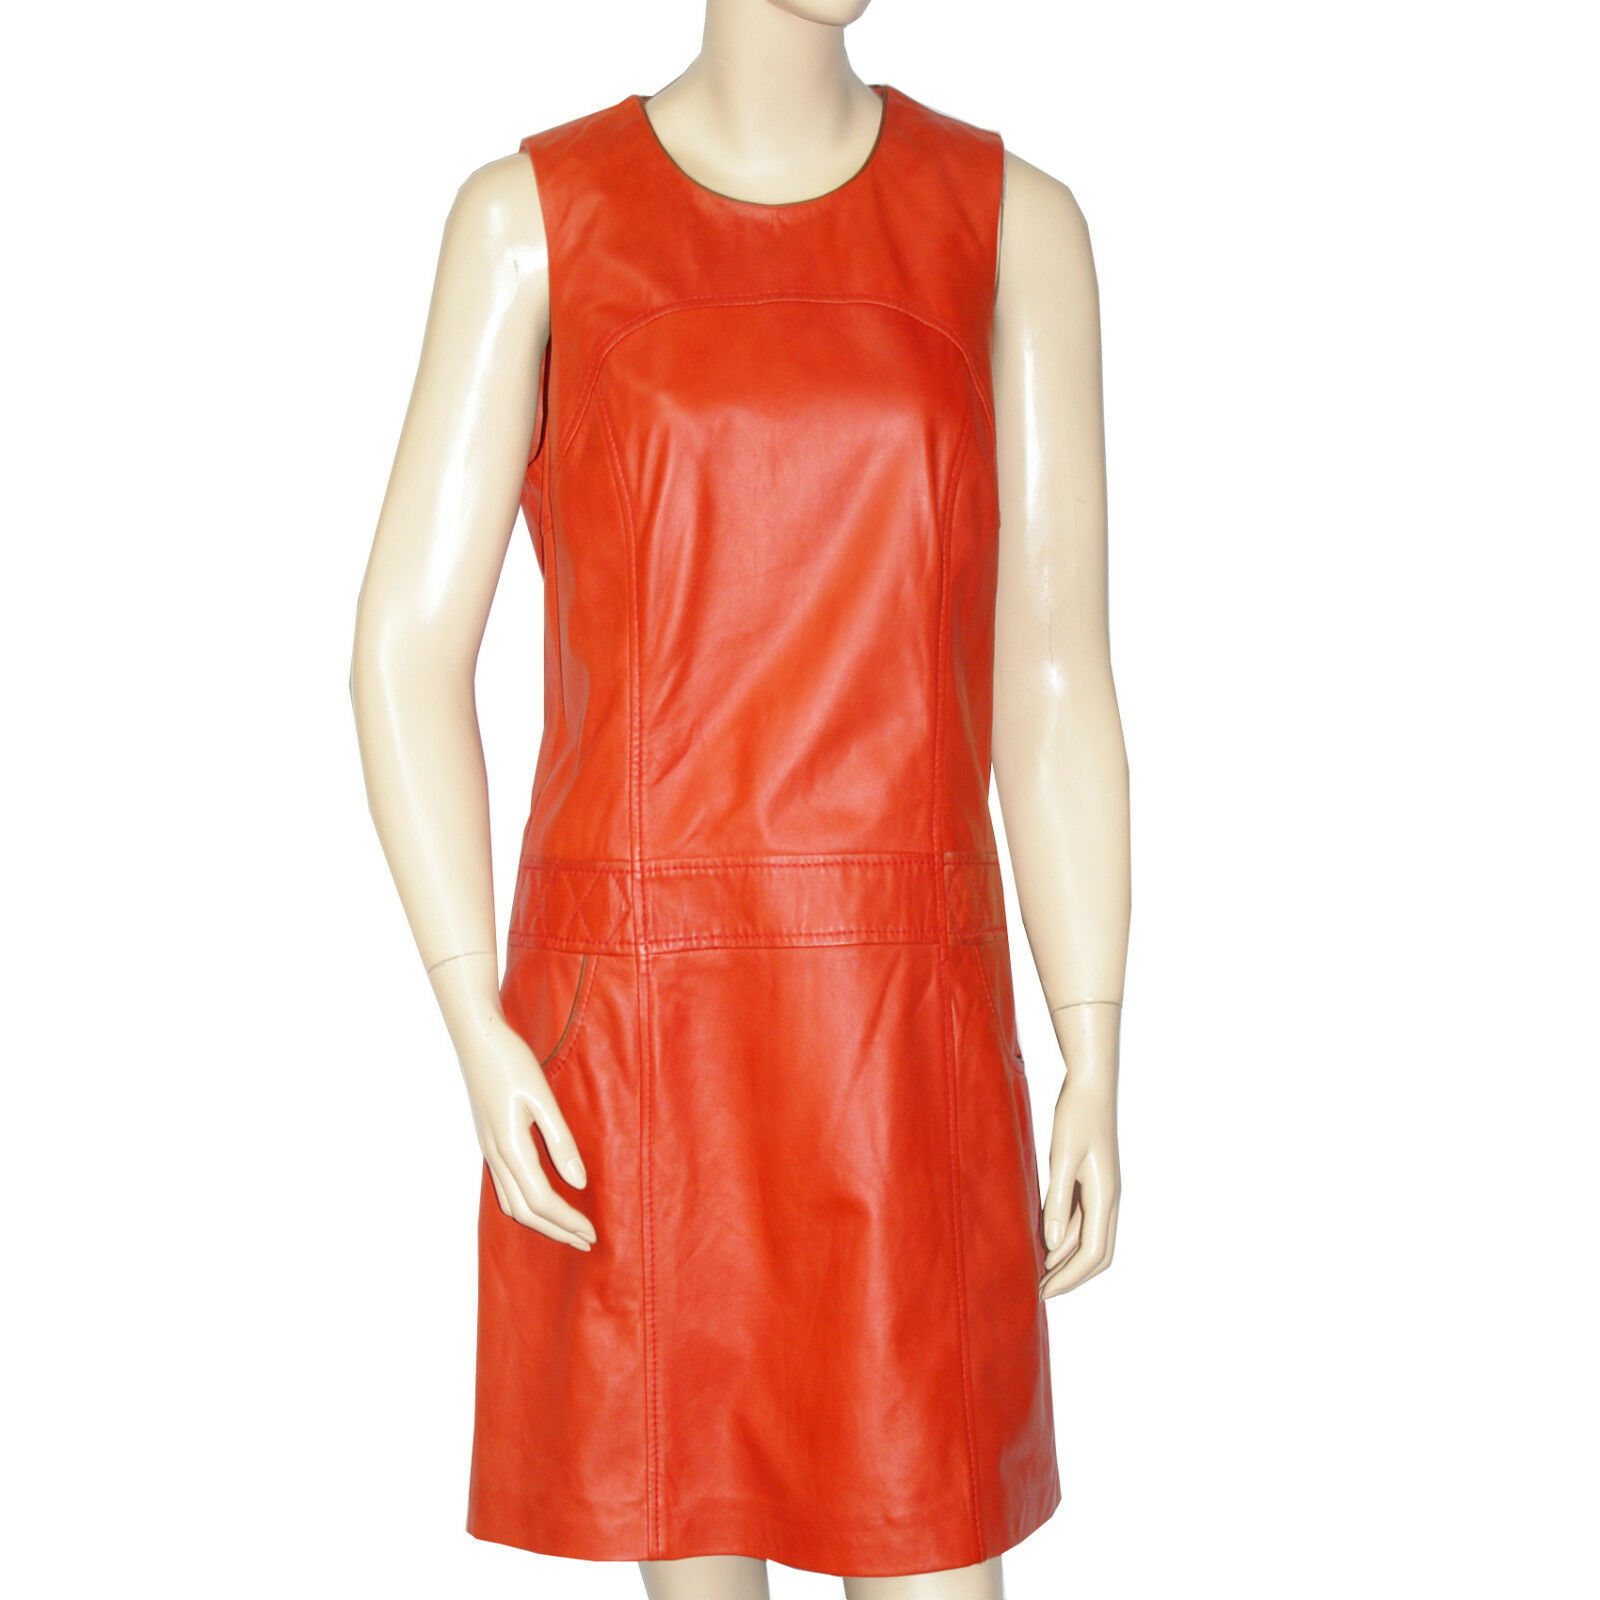 OAKWOOD Robe Robe Robe cuir agneau arancia Donna  leather dress Dimensione M 02c0a8